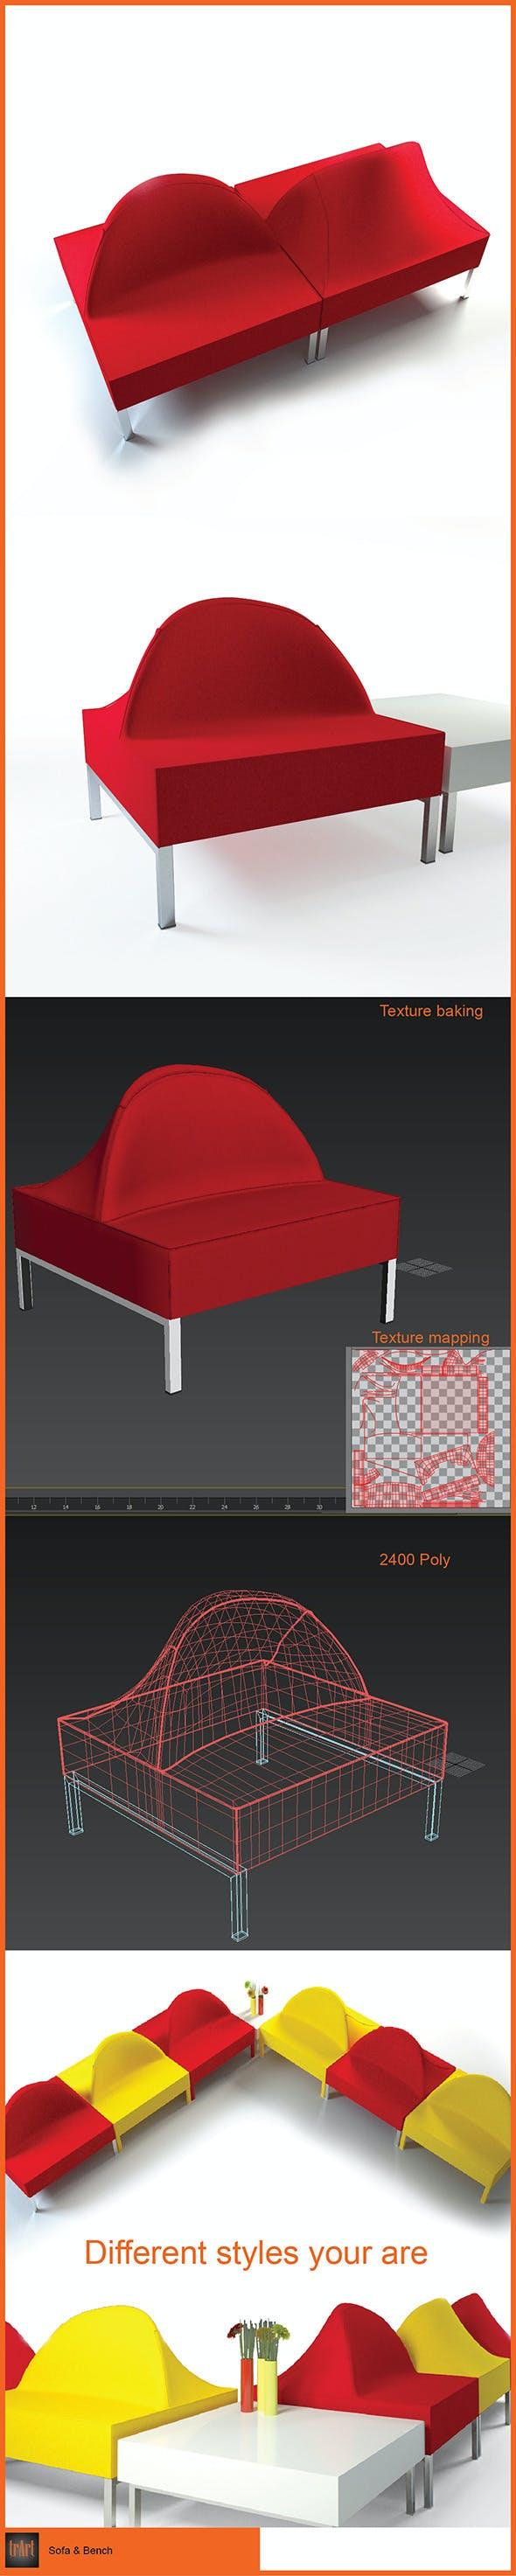 Sofa Bench - 3DOcean Item for Sale